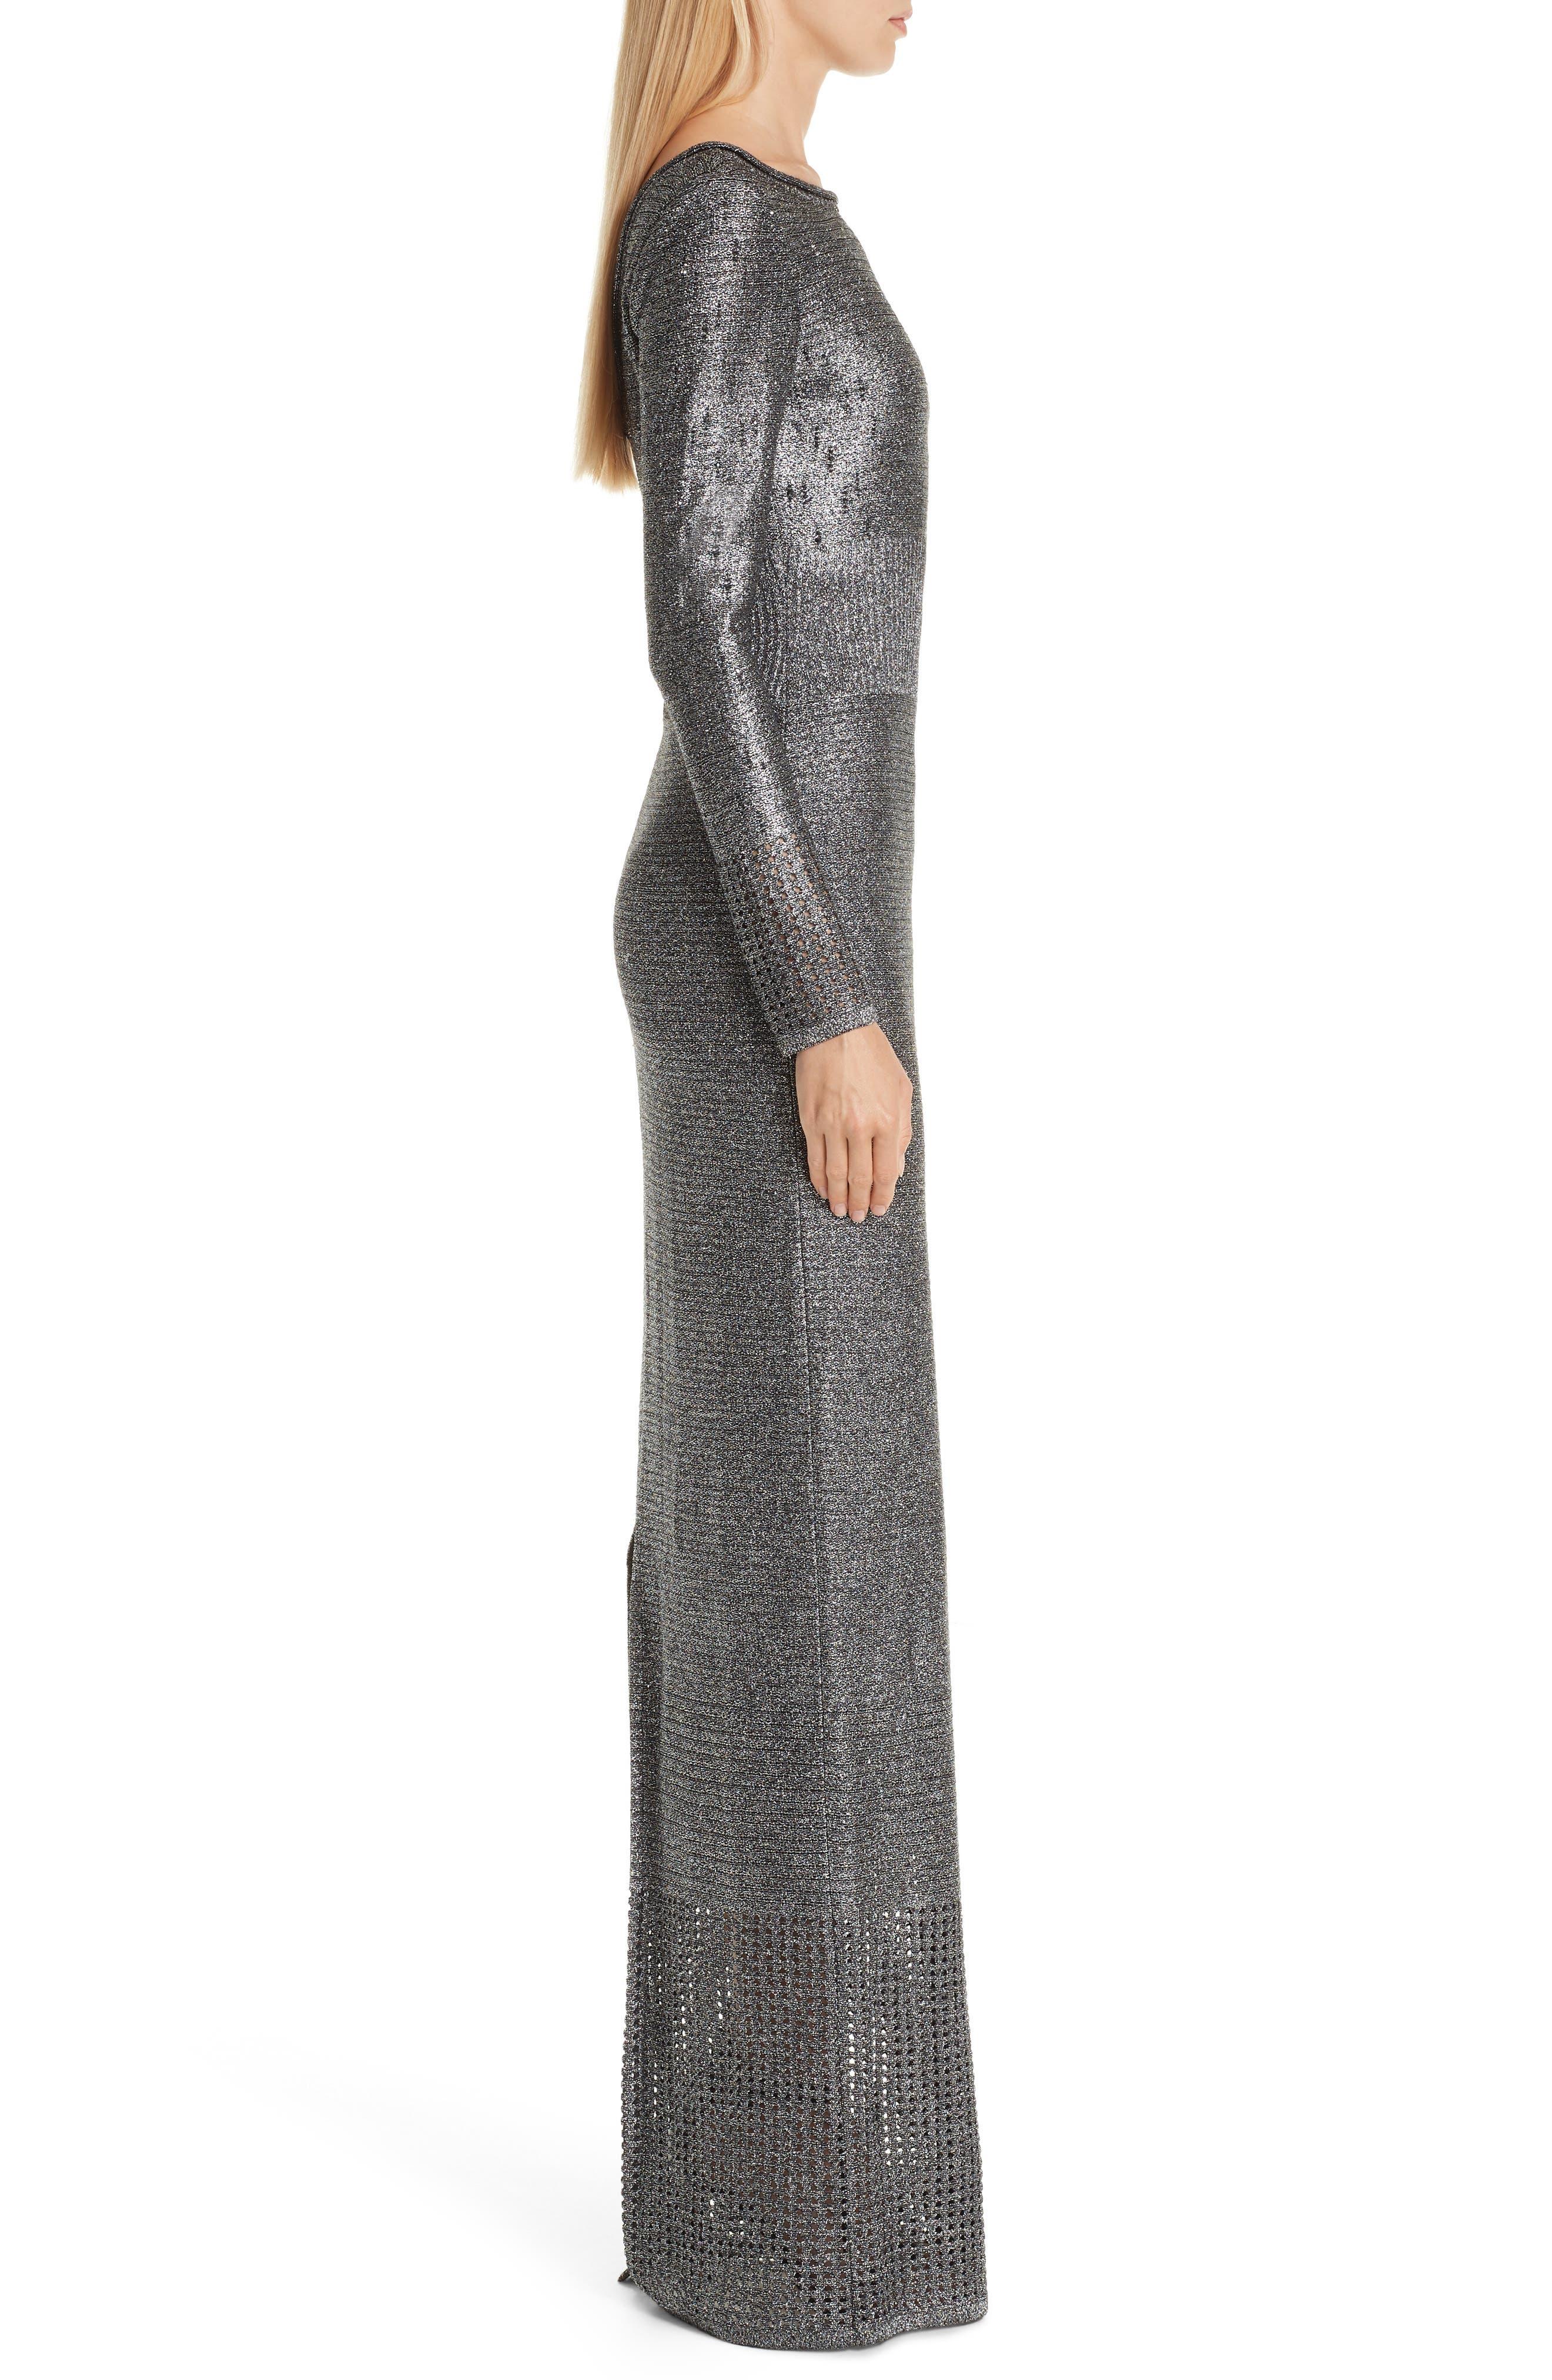 ST. JOHN COLLECTION, Metallic Plaited Mixed Knit Gown, Alternate thumbnail 3, color, GUNMETAL/ CAVIAR